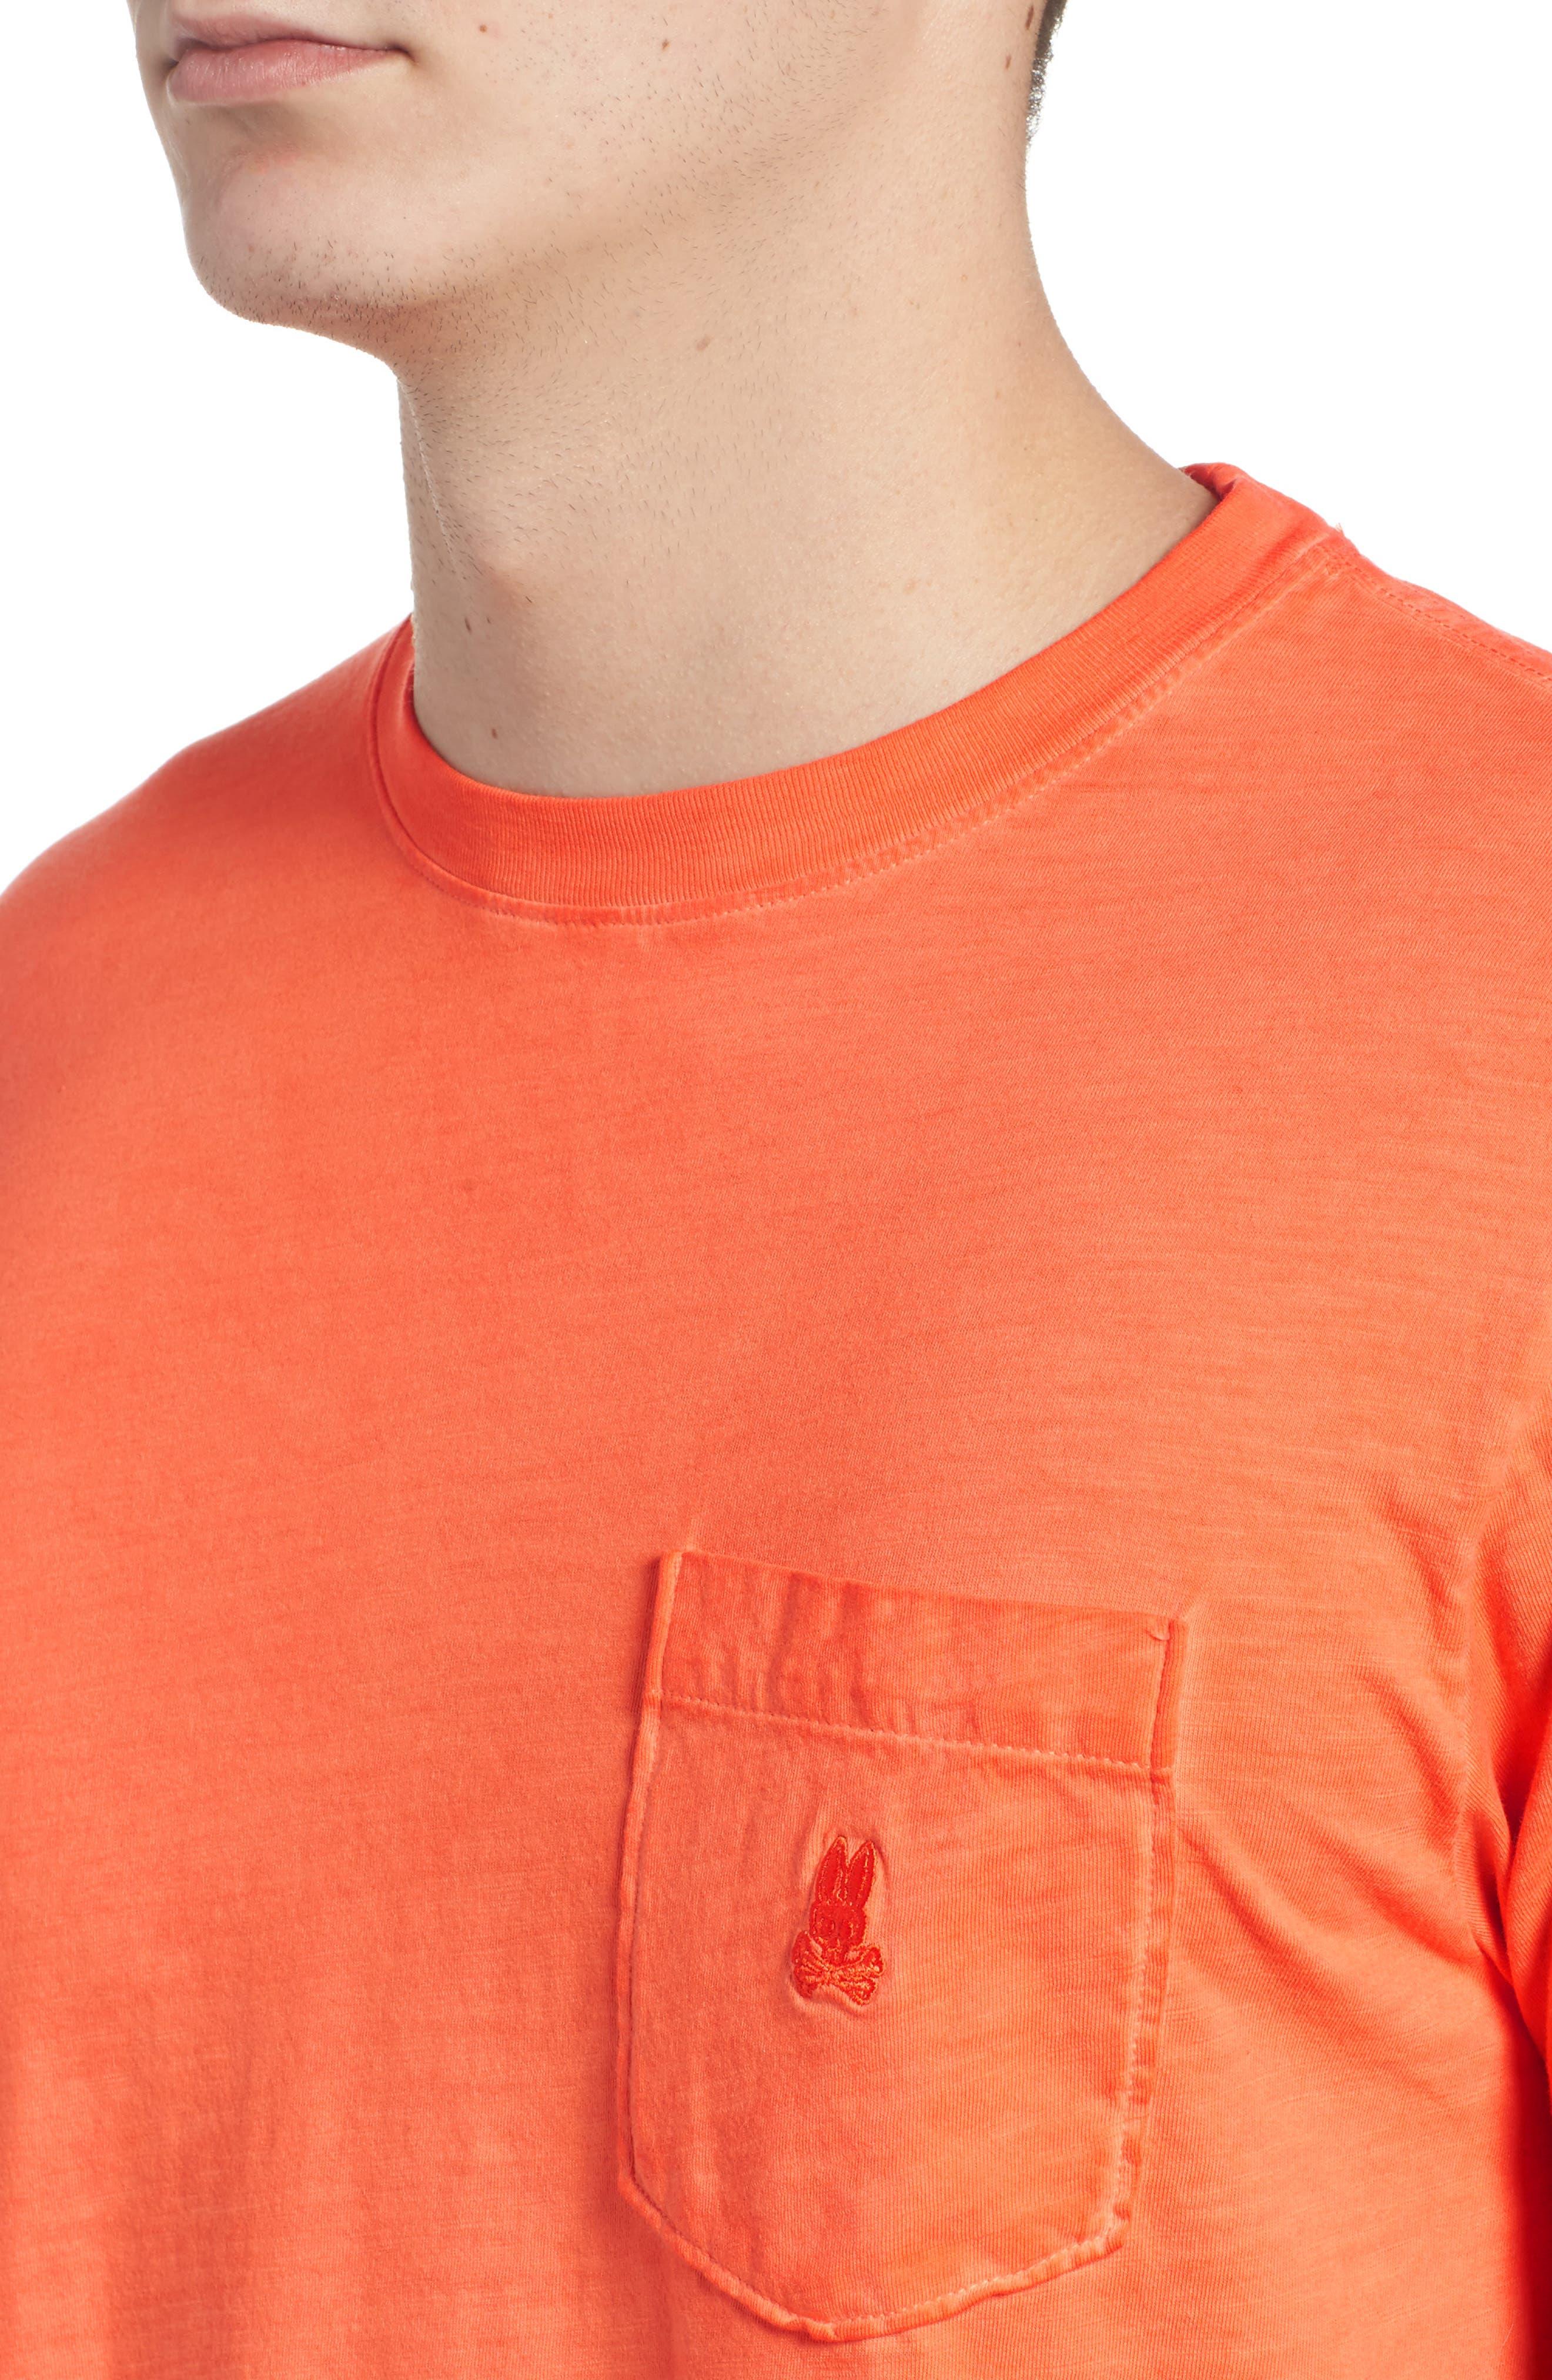 Sunwash Pocket T-Shirt,                             Alternate thumbnail 4, color,                             Mango